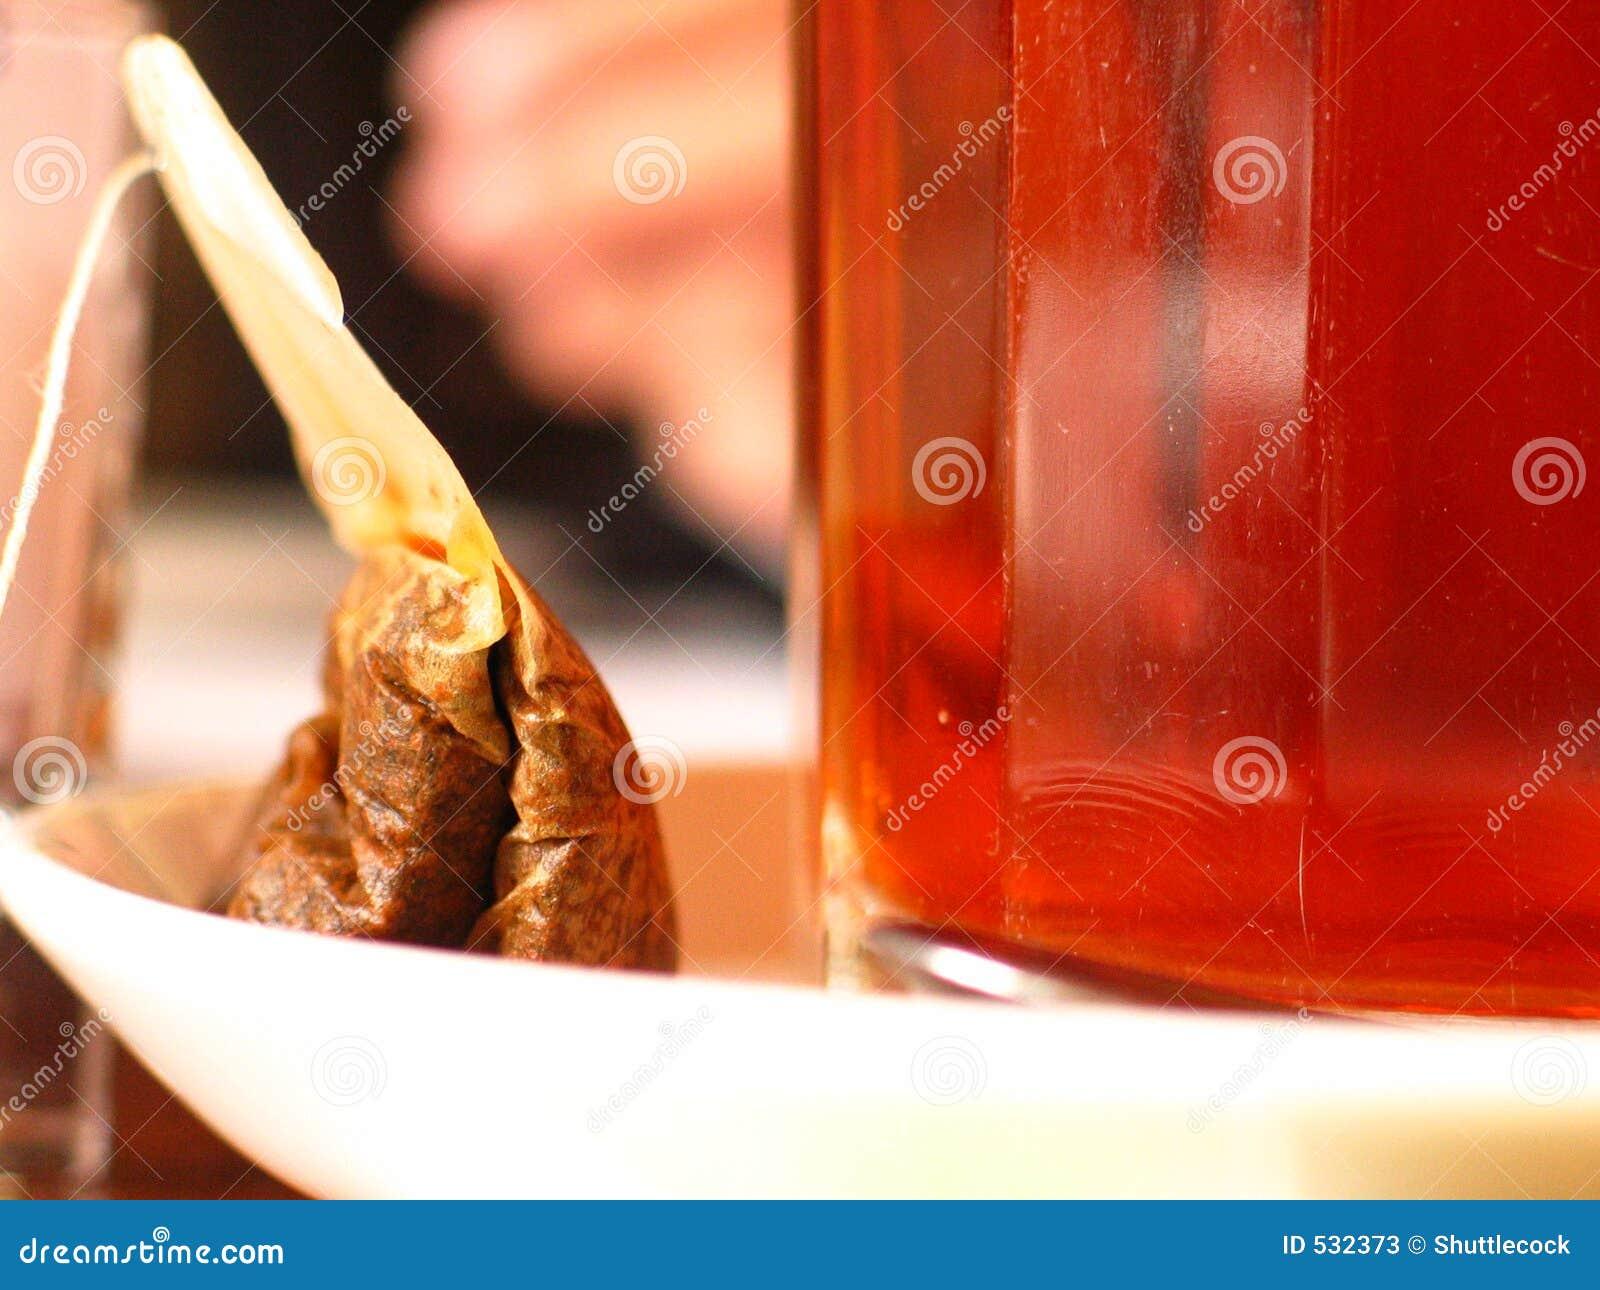 Download 袋子茶 库存图片. 图片 包括有 温暖, 注入, 纸张, 文化, 茶碟, 刷新, 液体, 放松, 茶袋, 草本 - 532373